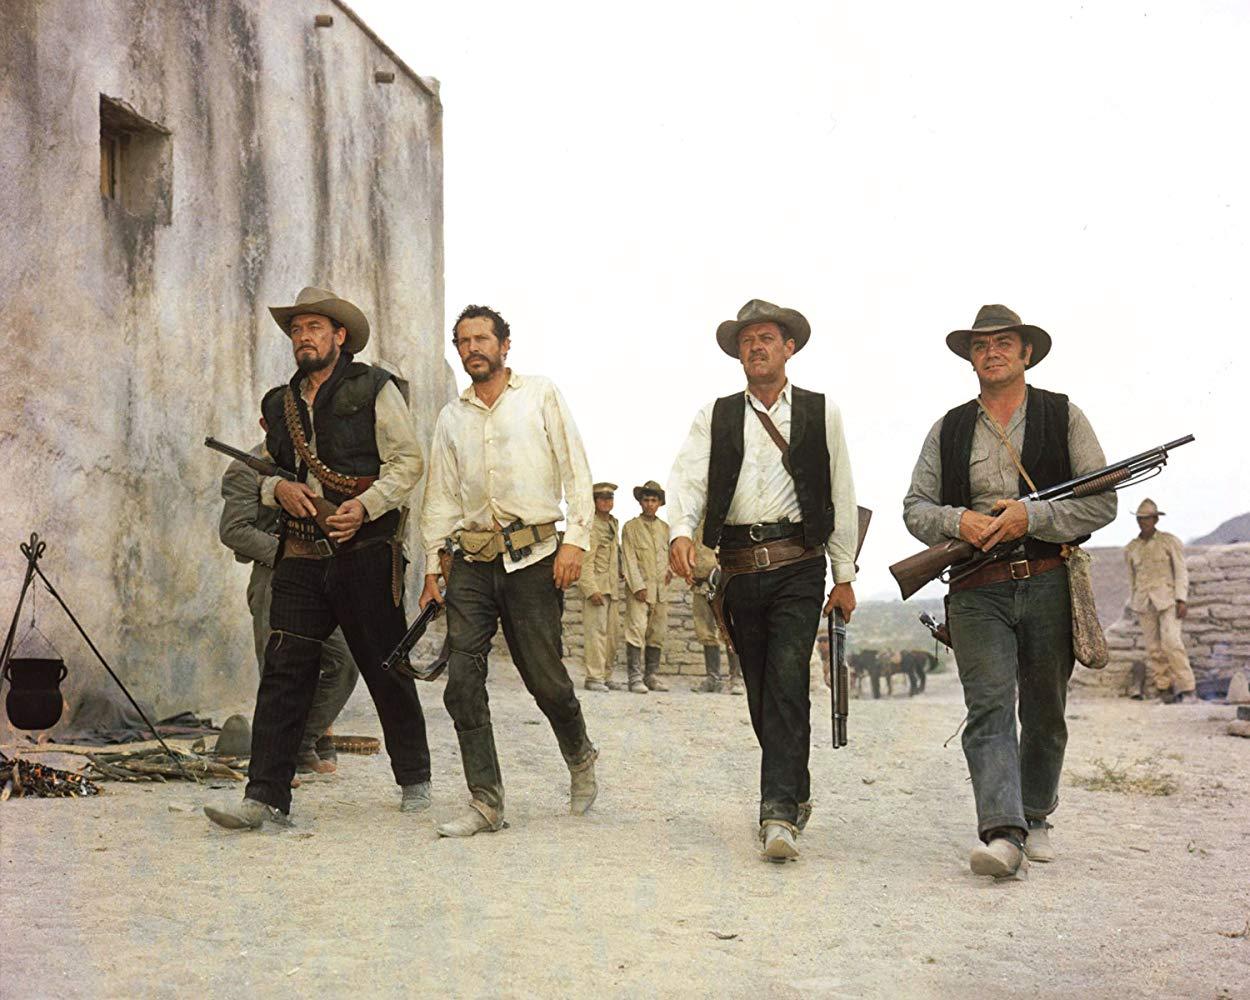 THE WILD BUNCHwerter - 10 فیلم برتر وسترن که کمتر مورد توجه قرار گرفتهاند